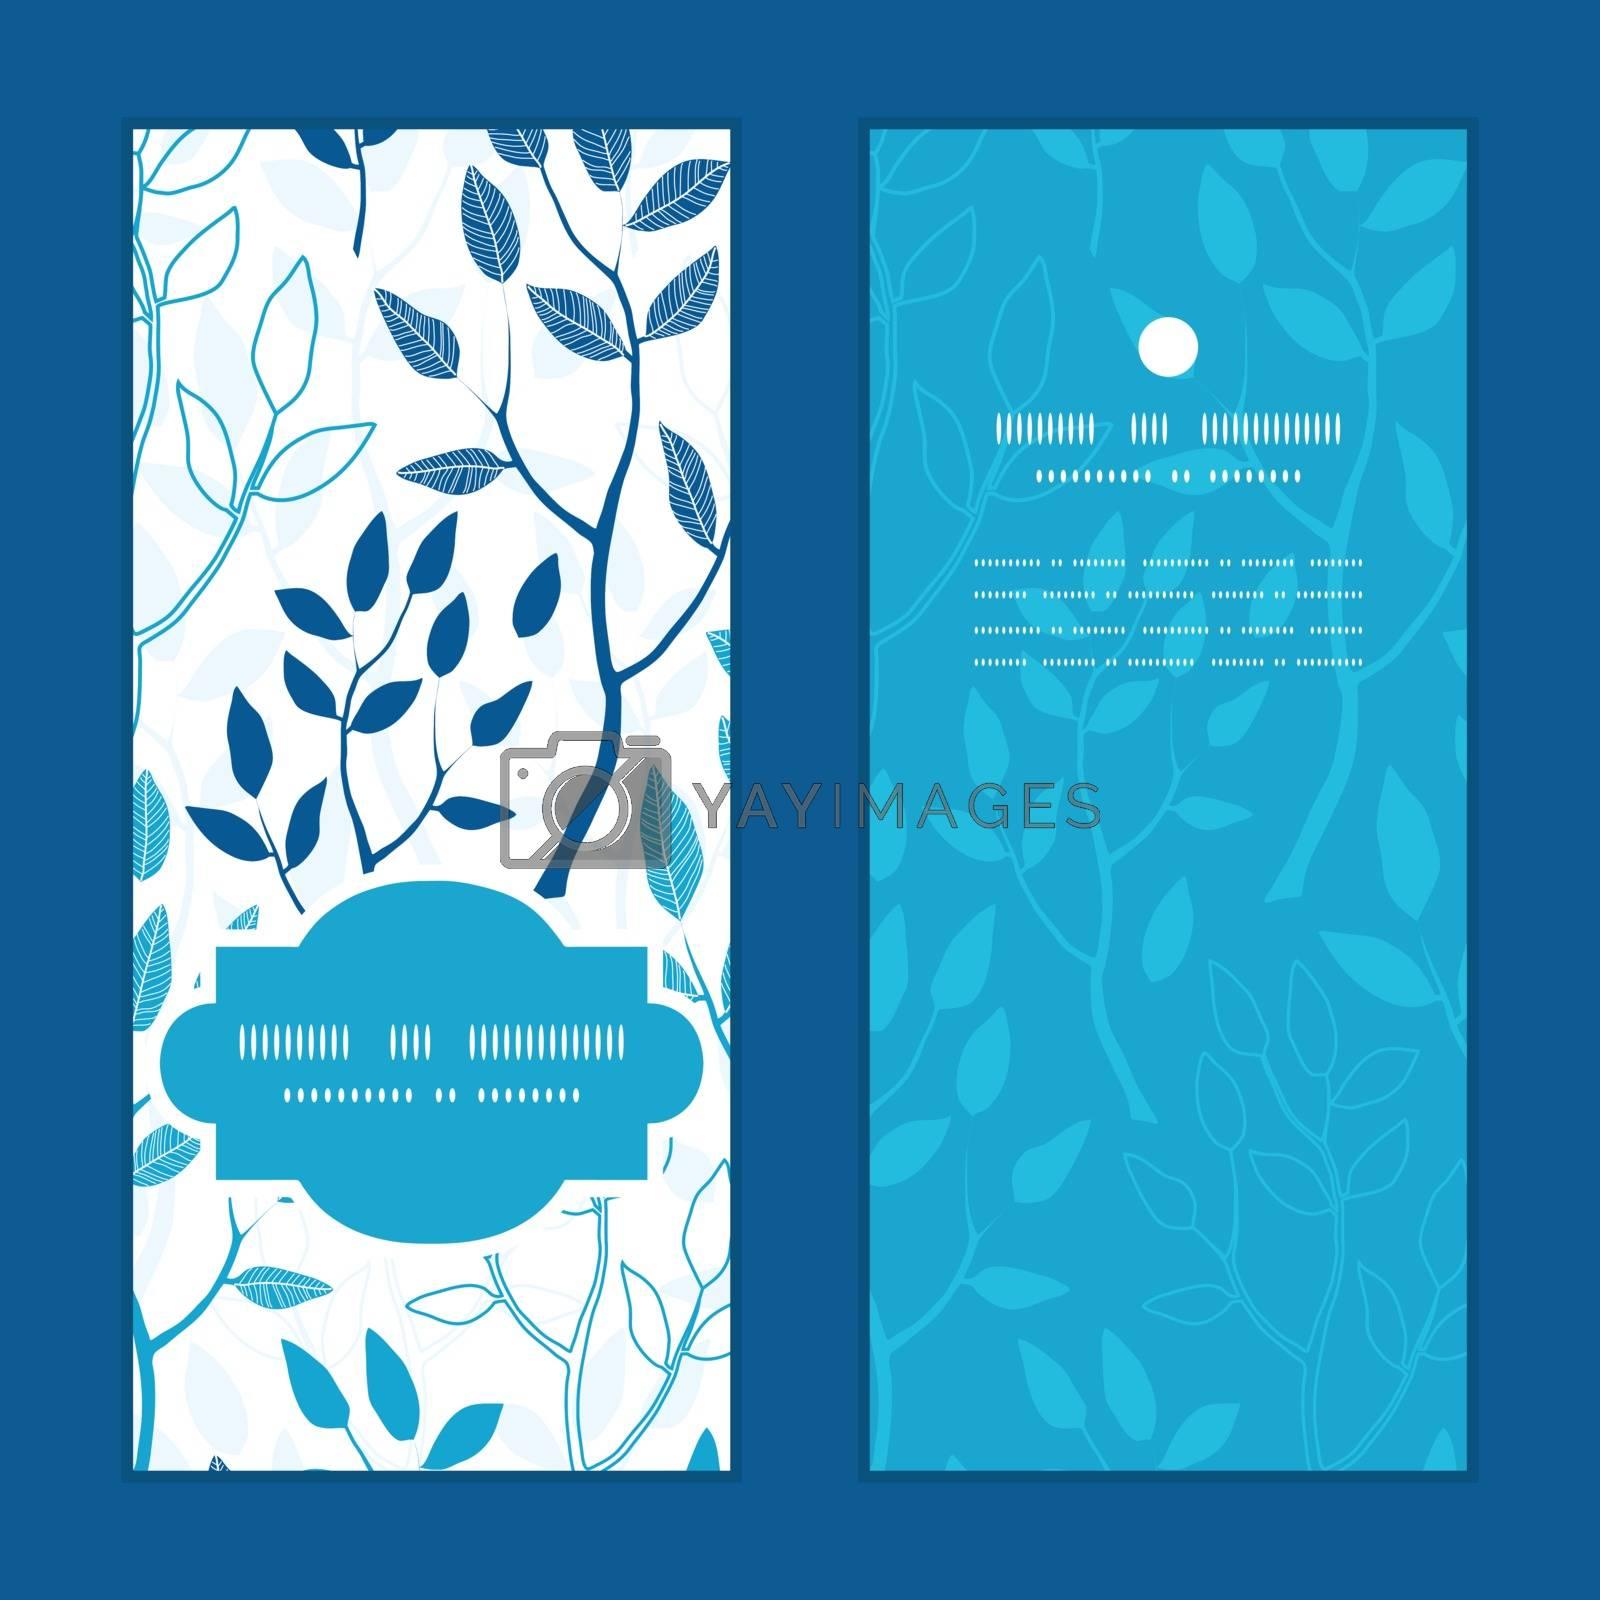 Vector blue forest vertical frame pattern invitation greeting cards set graphic design